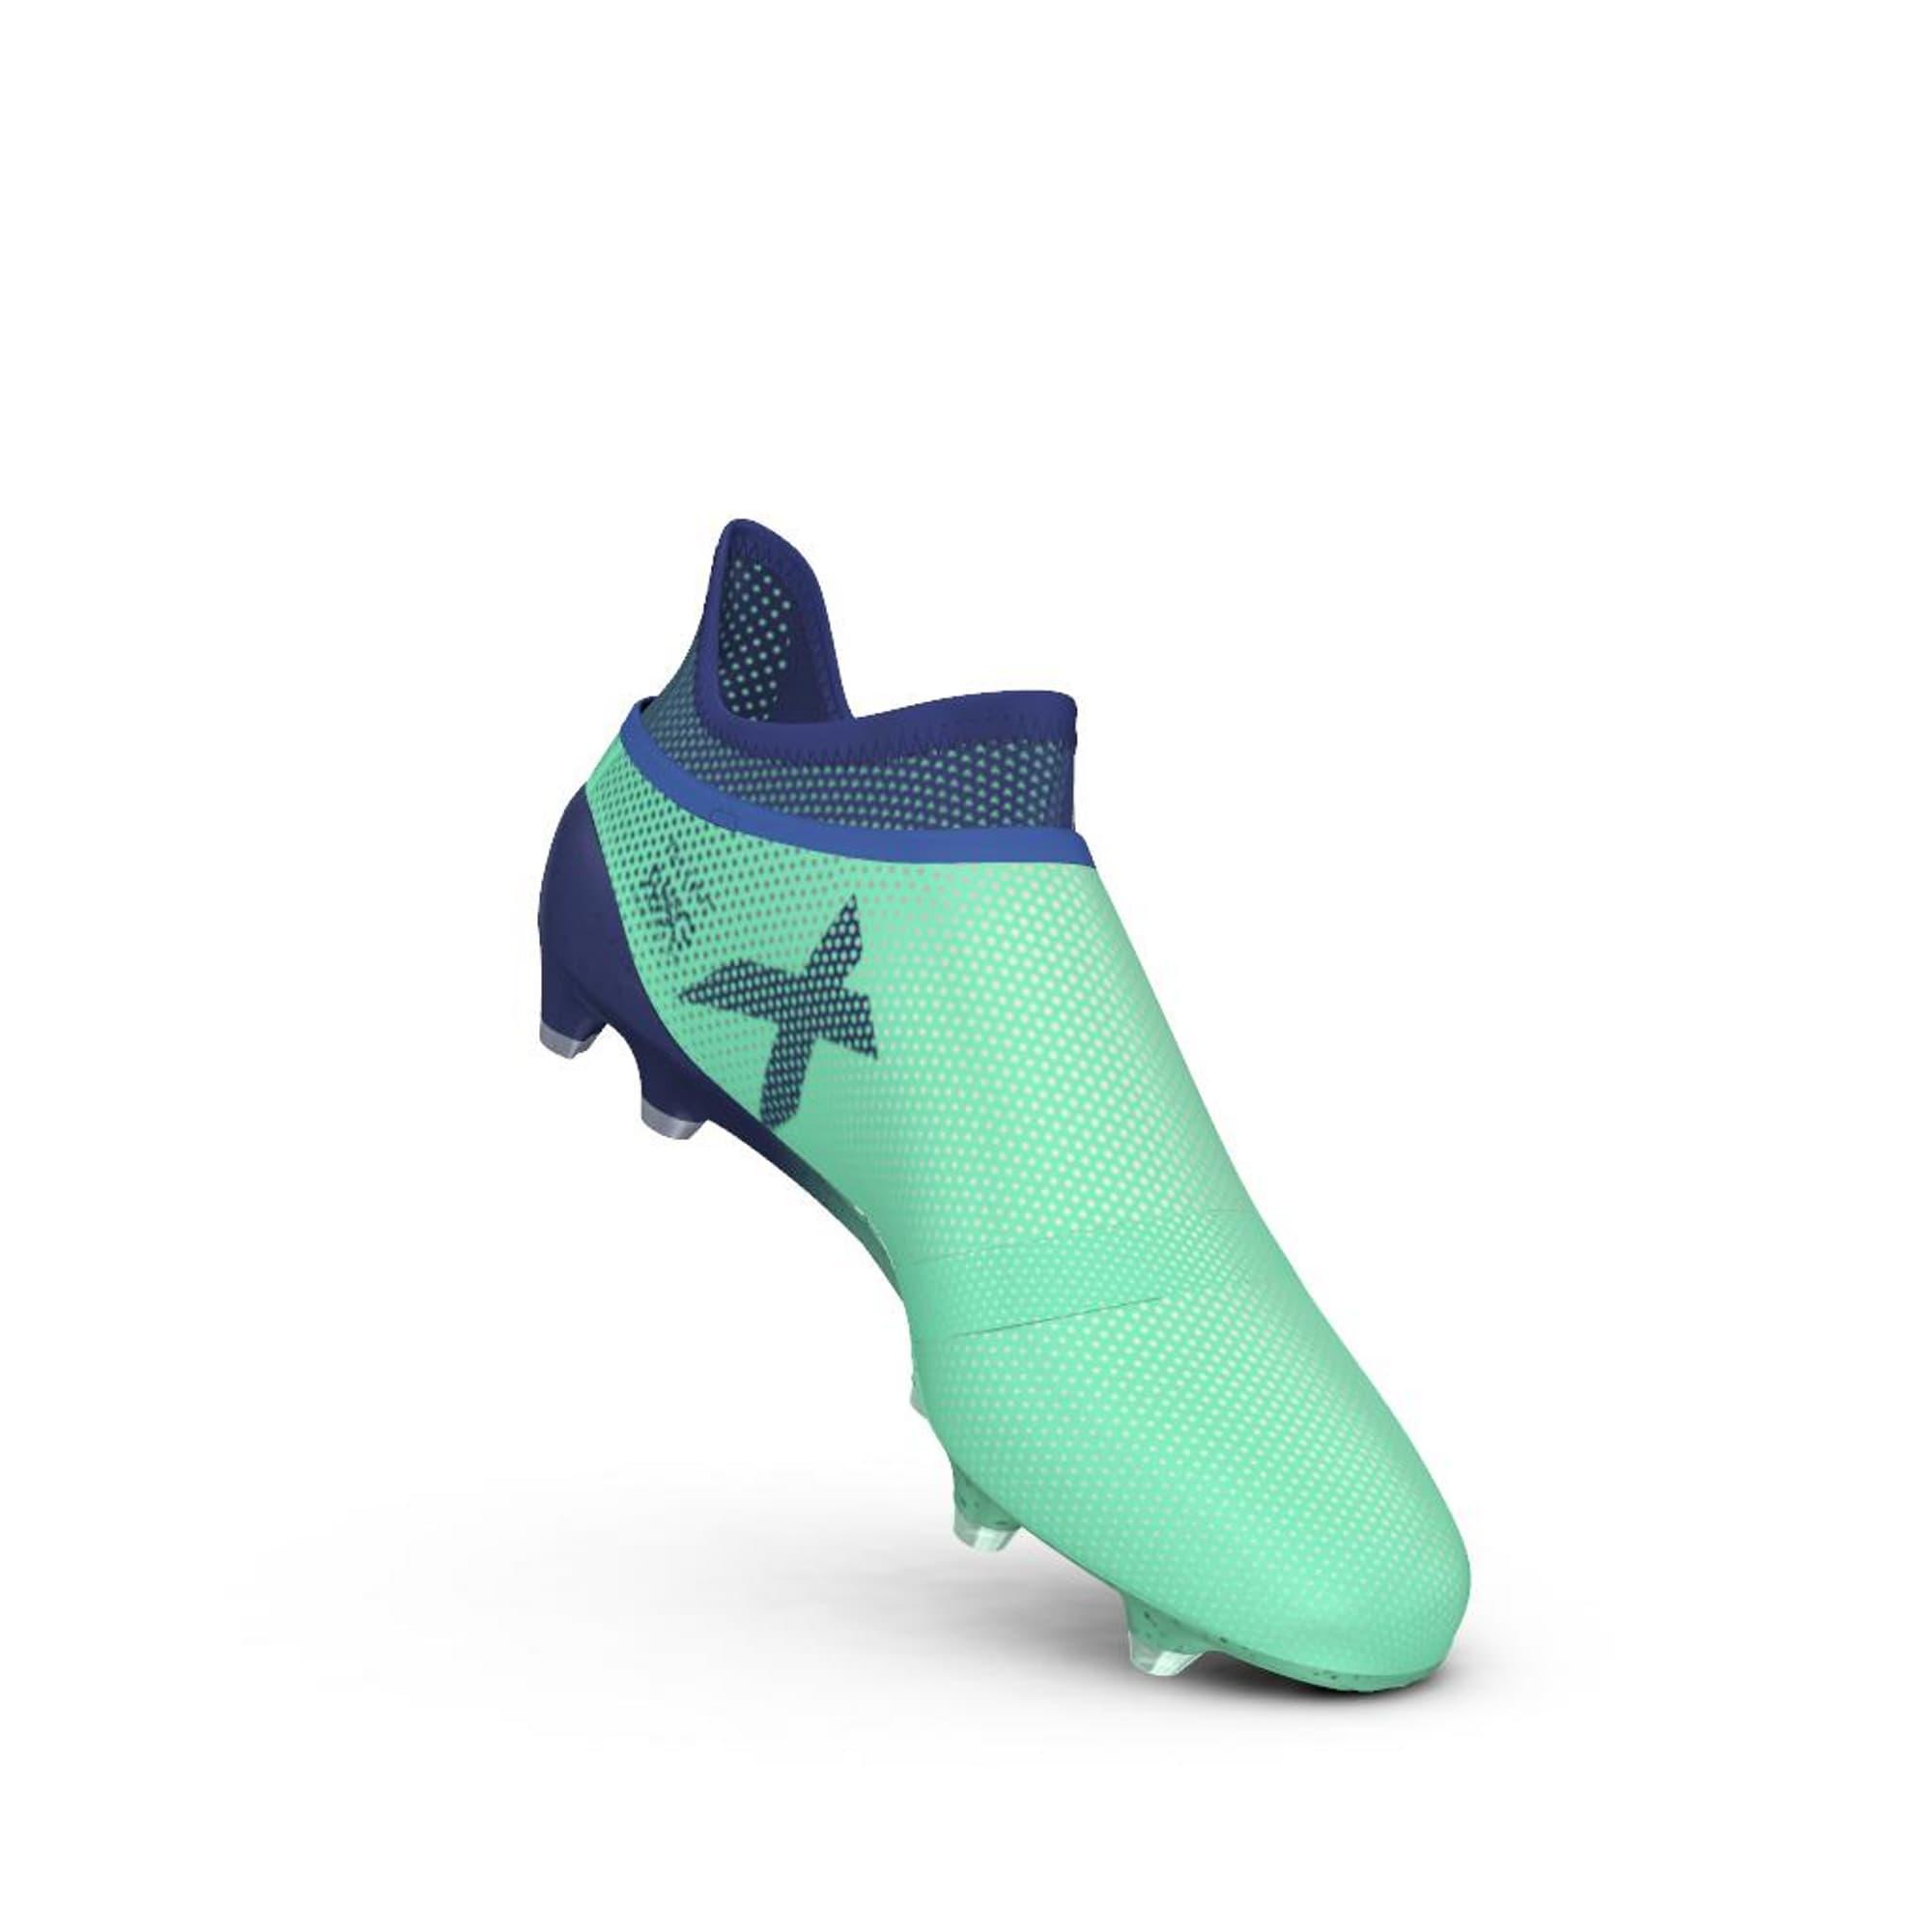 8d55956bf ... 50% off adidas x 17 firm ground boot aero green unity ink hi d9b06 024d1